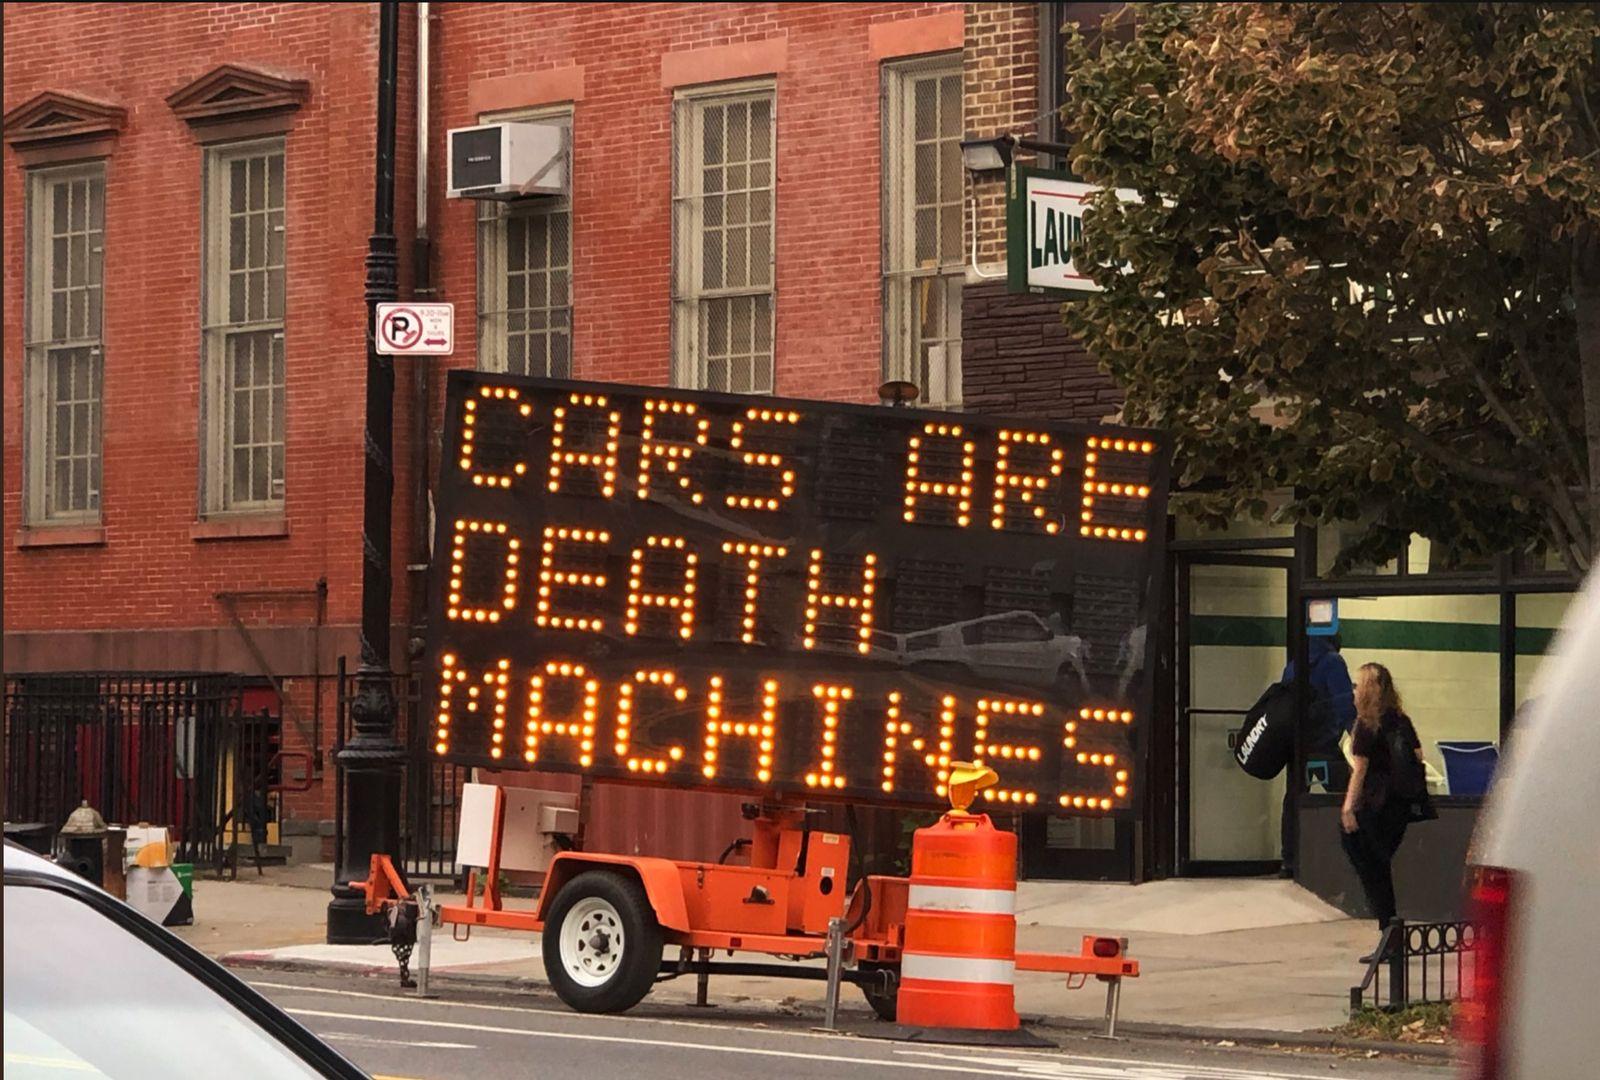 EINMALIGE VERWENDUNG NUR ALS ZITAT Screenshot/ Roadsigns/ Hacked/ Brooklyn